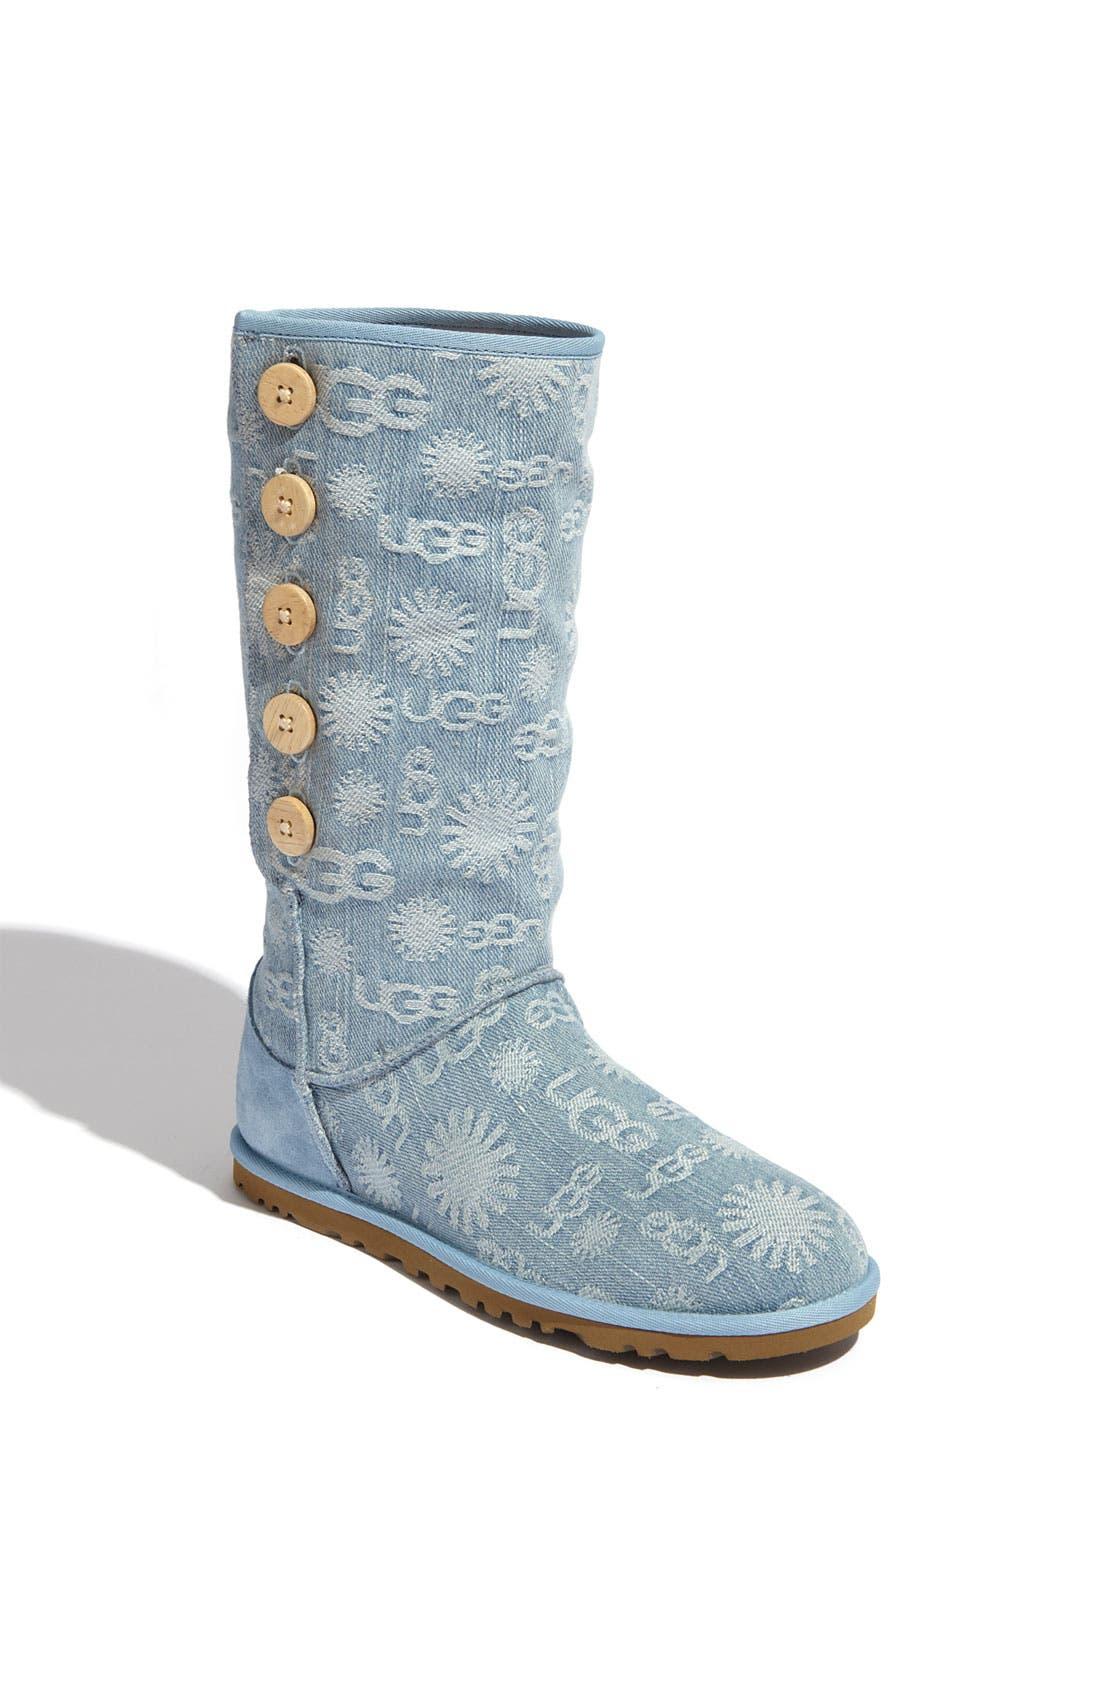 Main Image - UGG® Australia 'Lo Pro' Boot (Women)